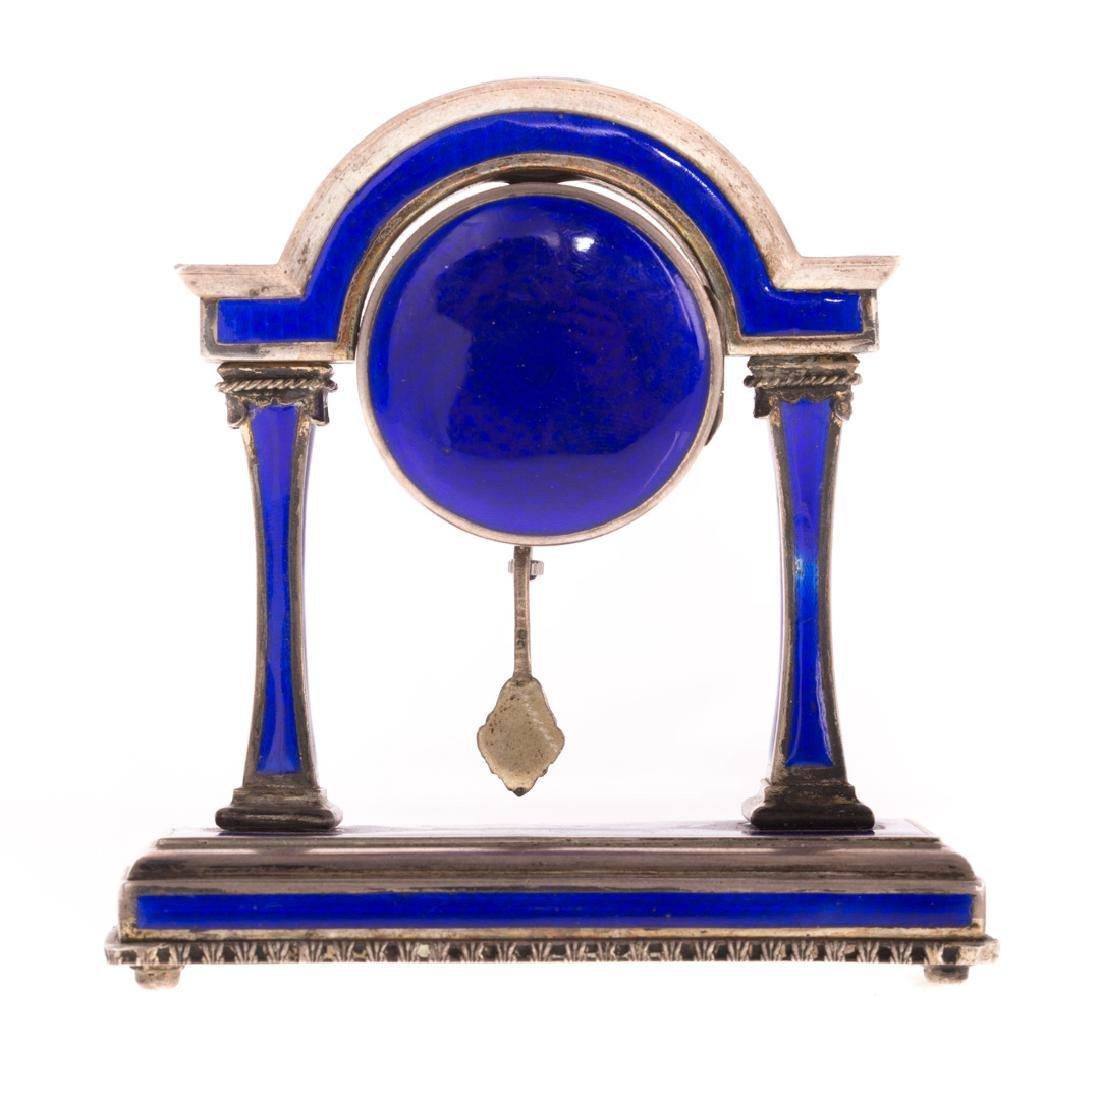 A French Blue Enamel Pedestal Clock - 4